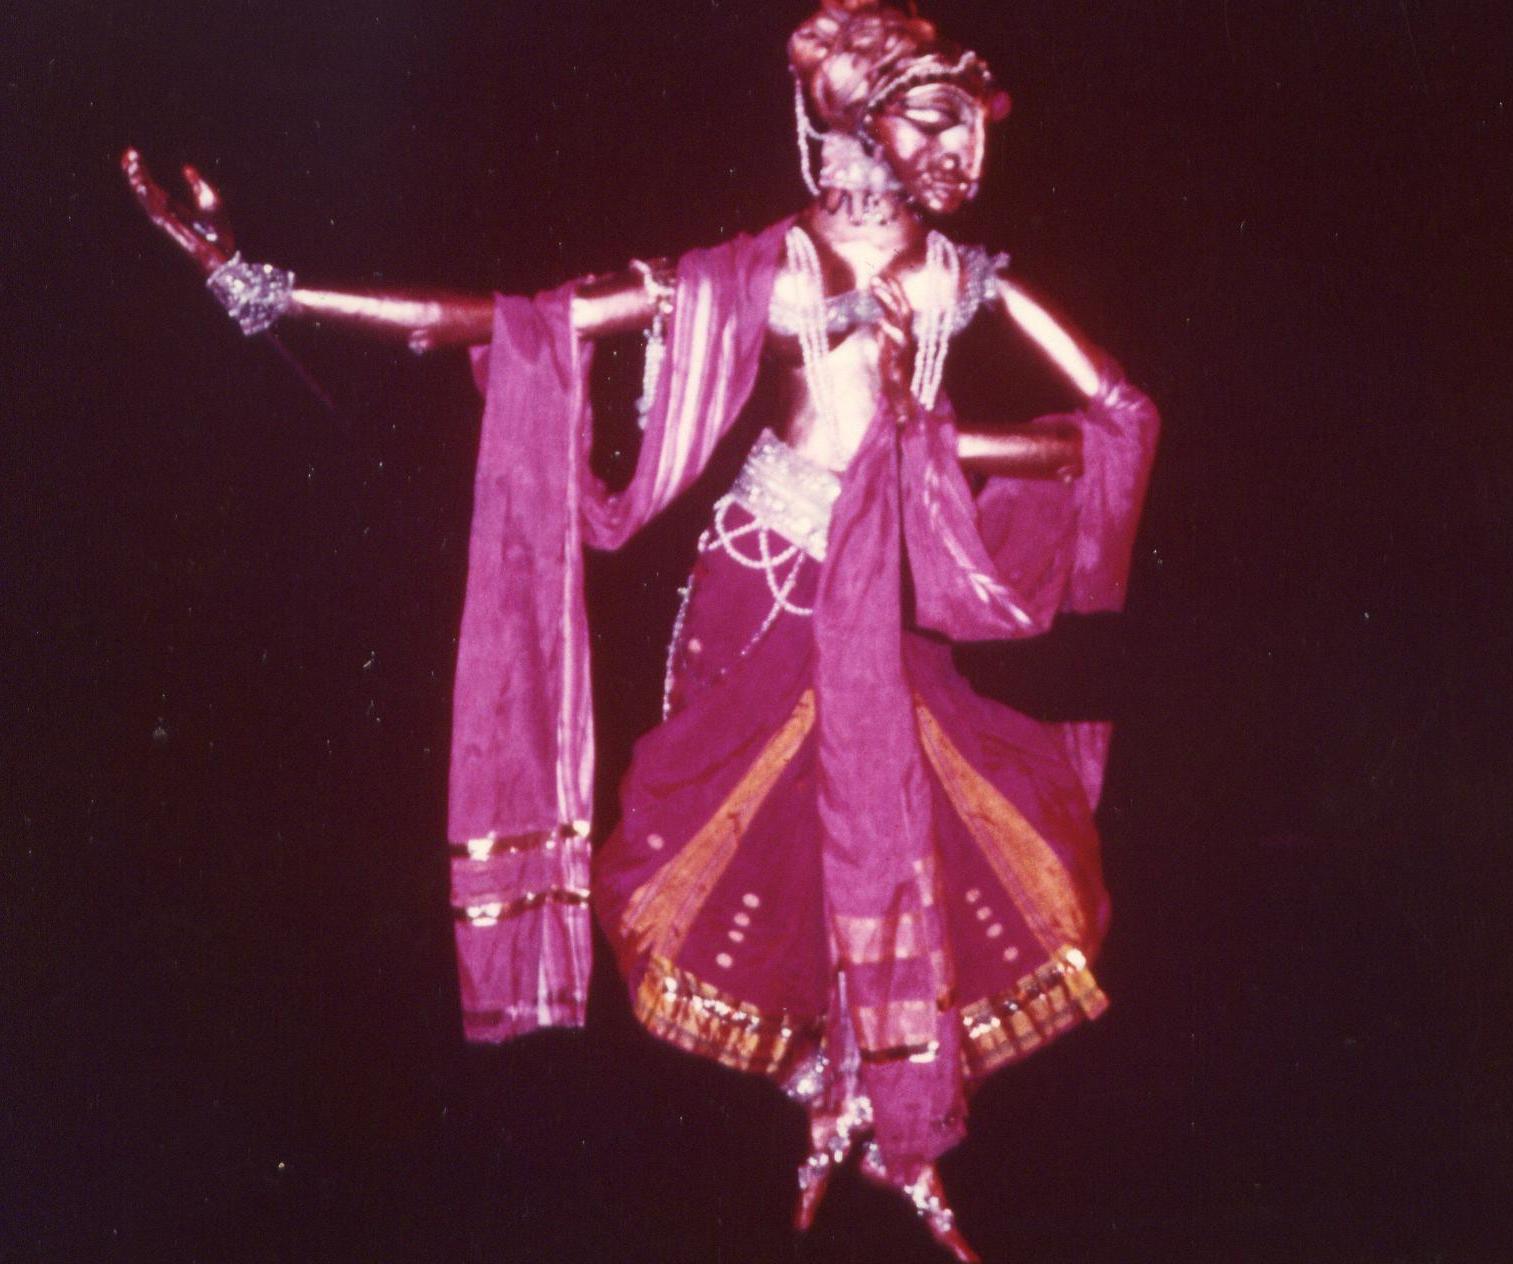 La danse d'Usha, dans <em>Utsav</em> (1983), un spe<em>c</em>ta<em>c</em>le basé sur trois piè<em>c</em>es de danse vues <em>c</em>omme une <em>c</em>élébration de la vie, mise en s<em>c</em>ène et <em>c</em>on<em>c</em>eption : Dadi D. Pudumjee, <em>c</em>onstru<em>c</em>tion de marionnettes : Dadi Pudumjee et les marionnettistes de Sutradhar. Marionnette à tiges grande manipulée par trois marionnettistes dans le style Bunraku. Photo: David Heesen